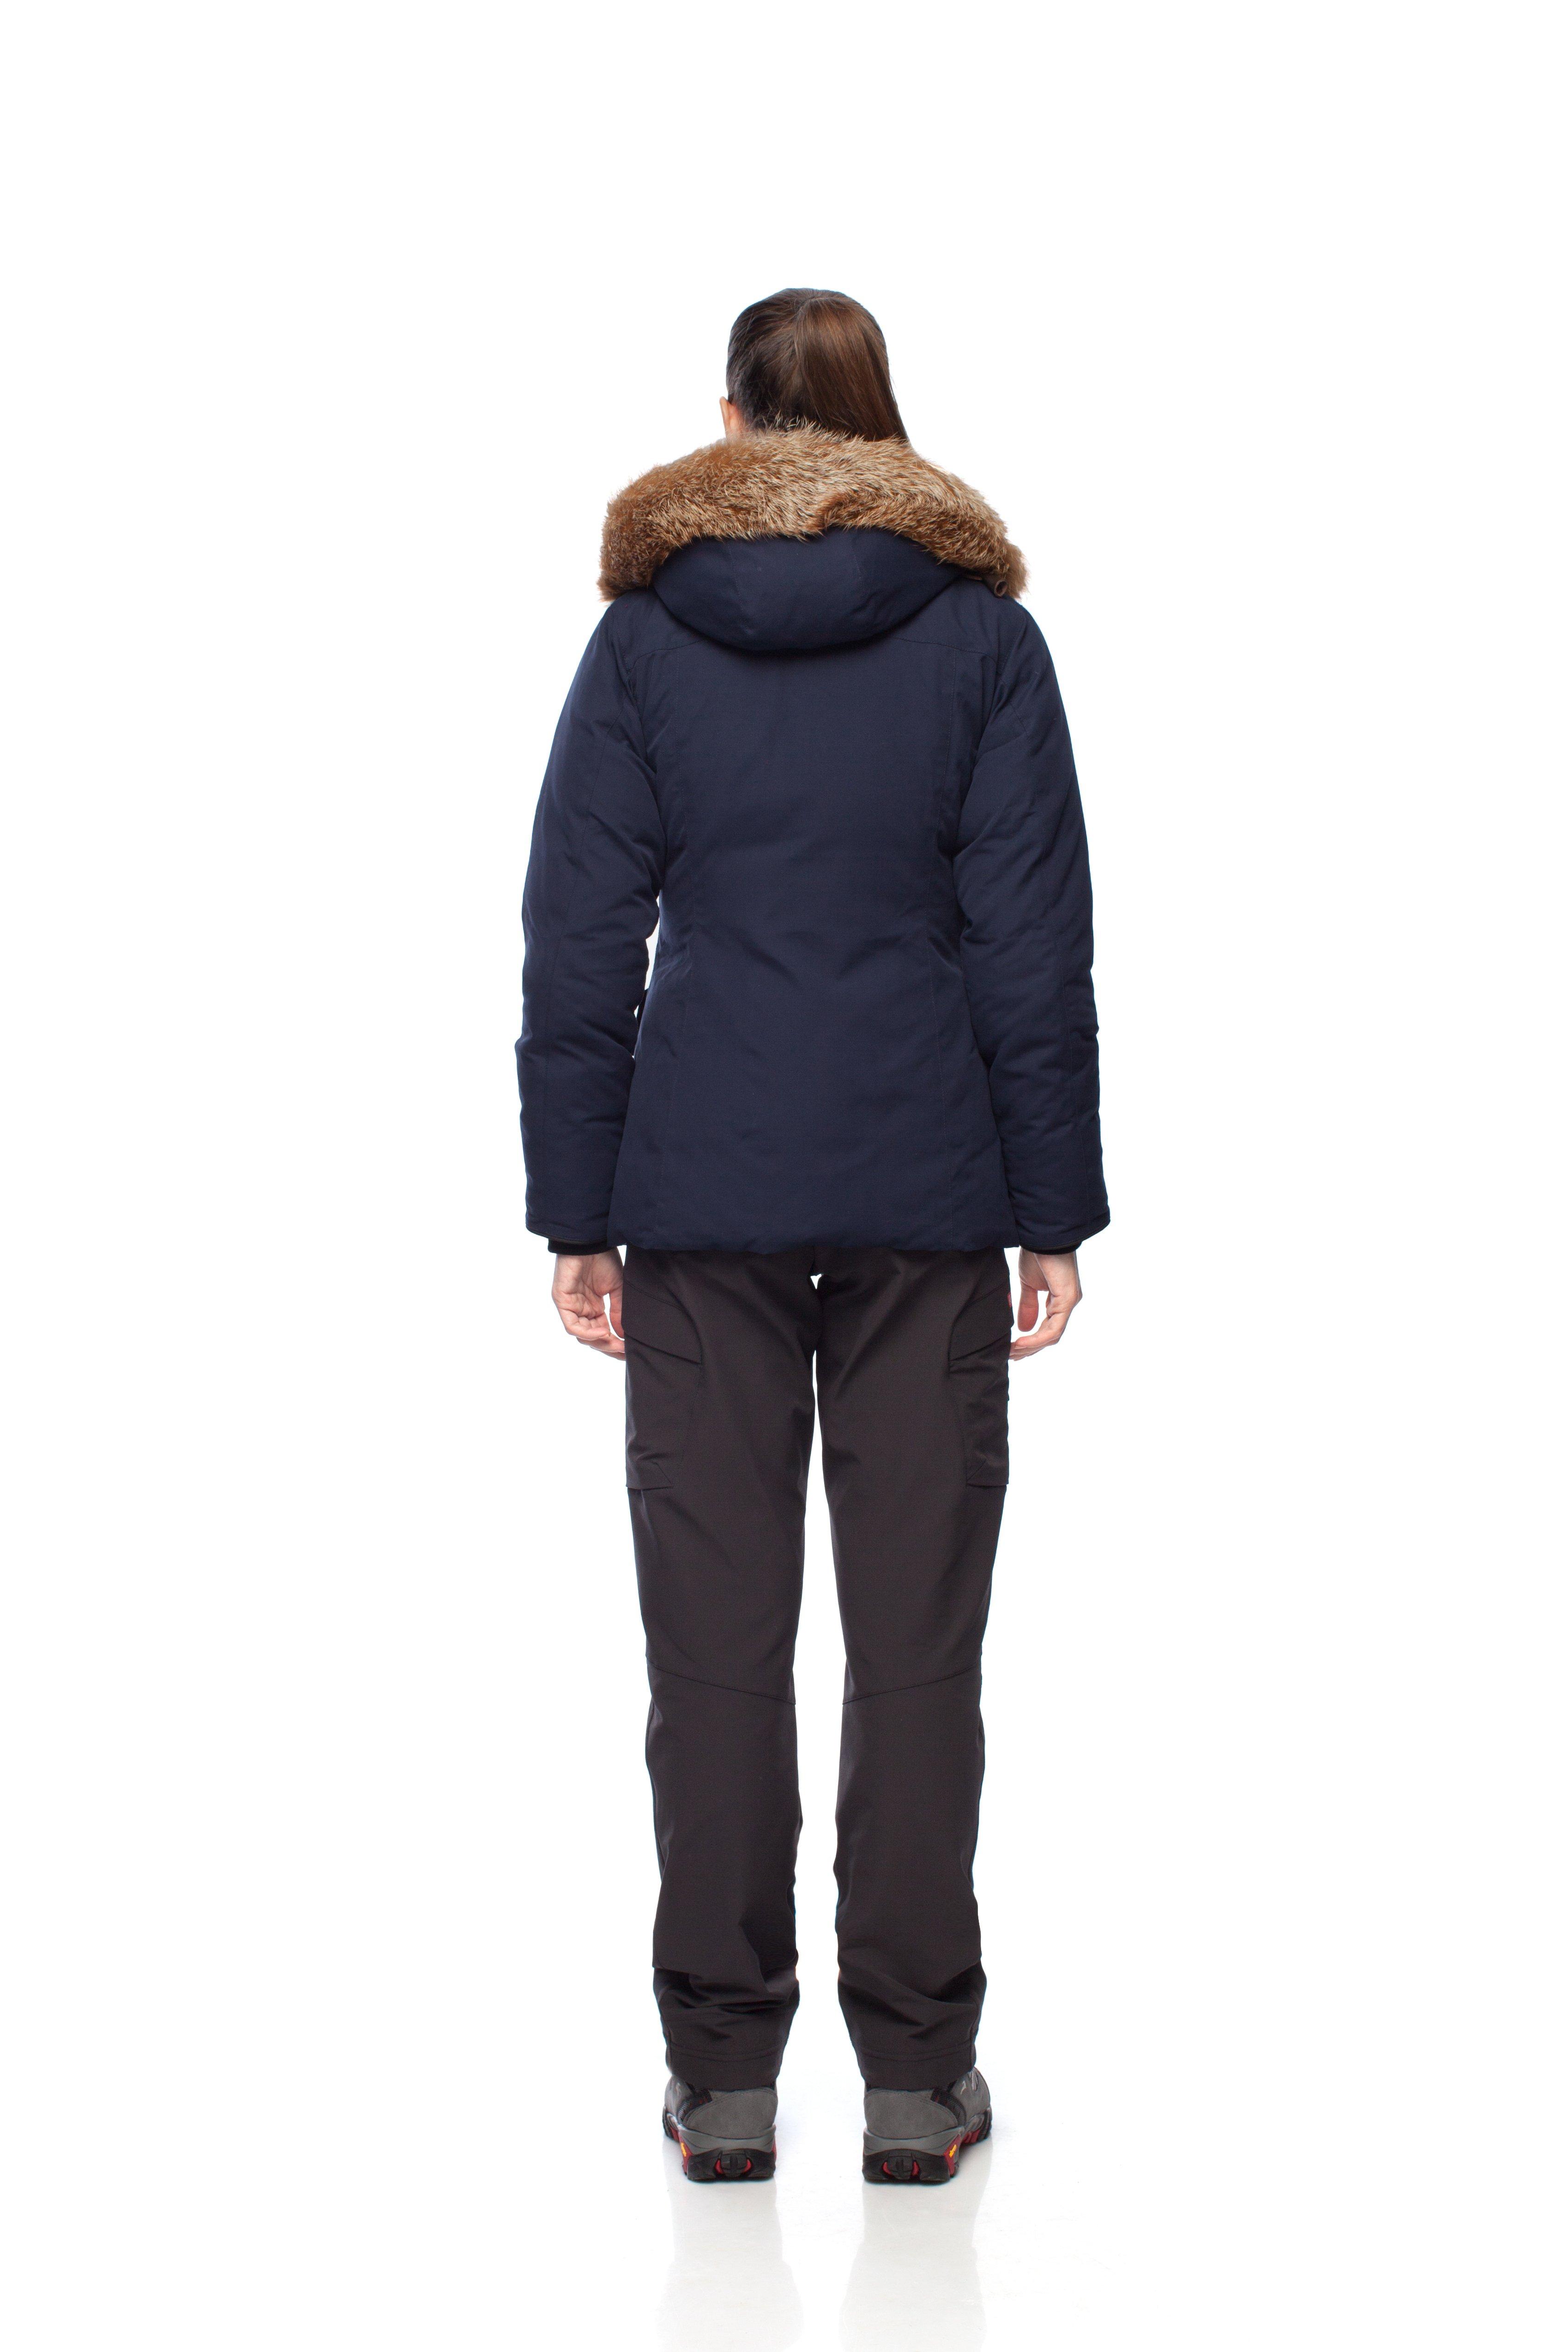 Куртка BASK INTA 1463, INTA